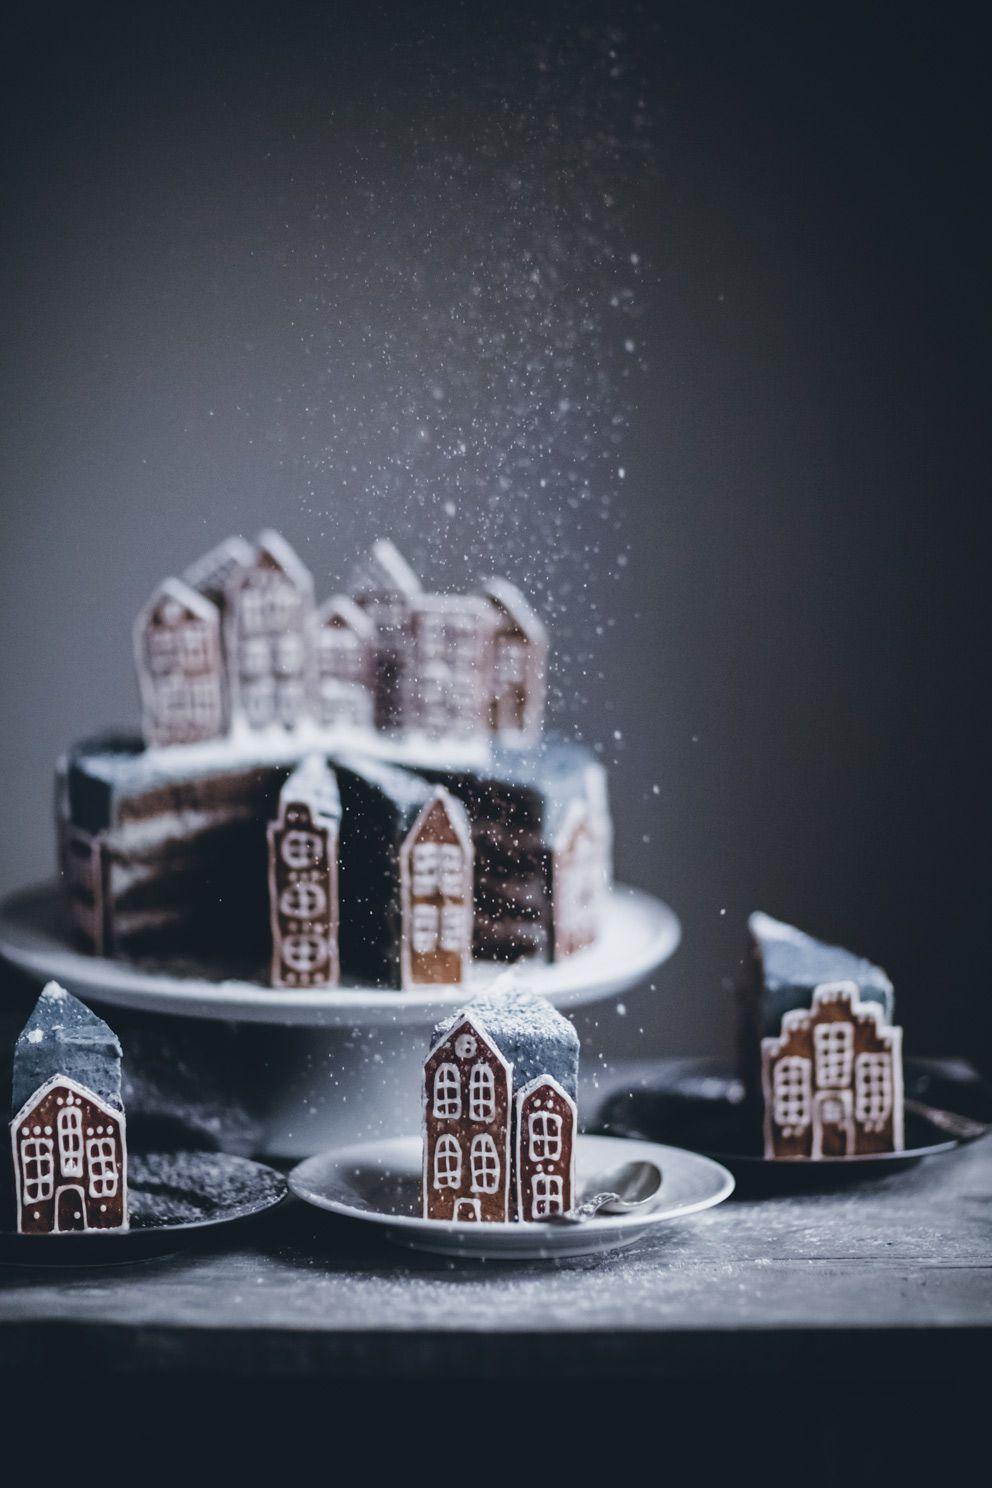 Gingerbread Village Cake - Call Me Cupcake - Christmas